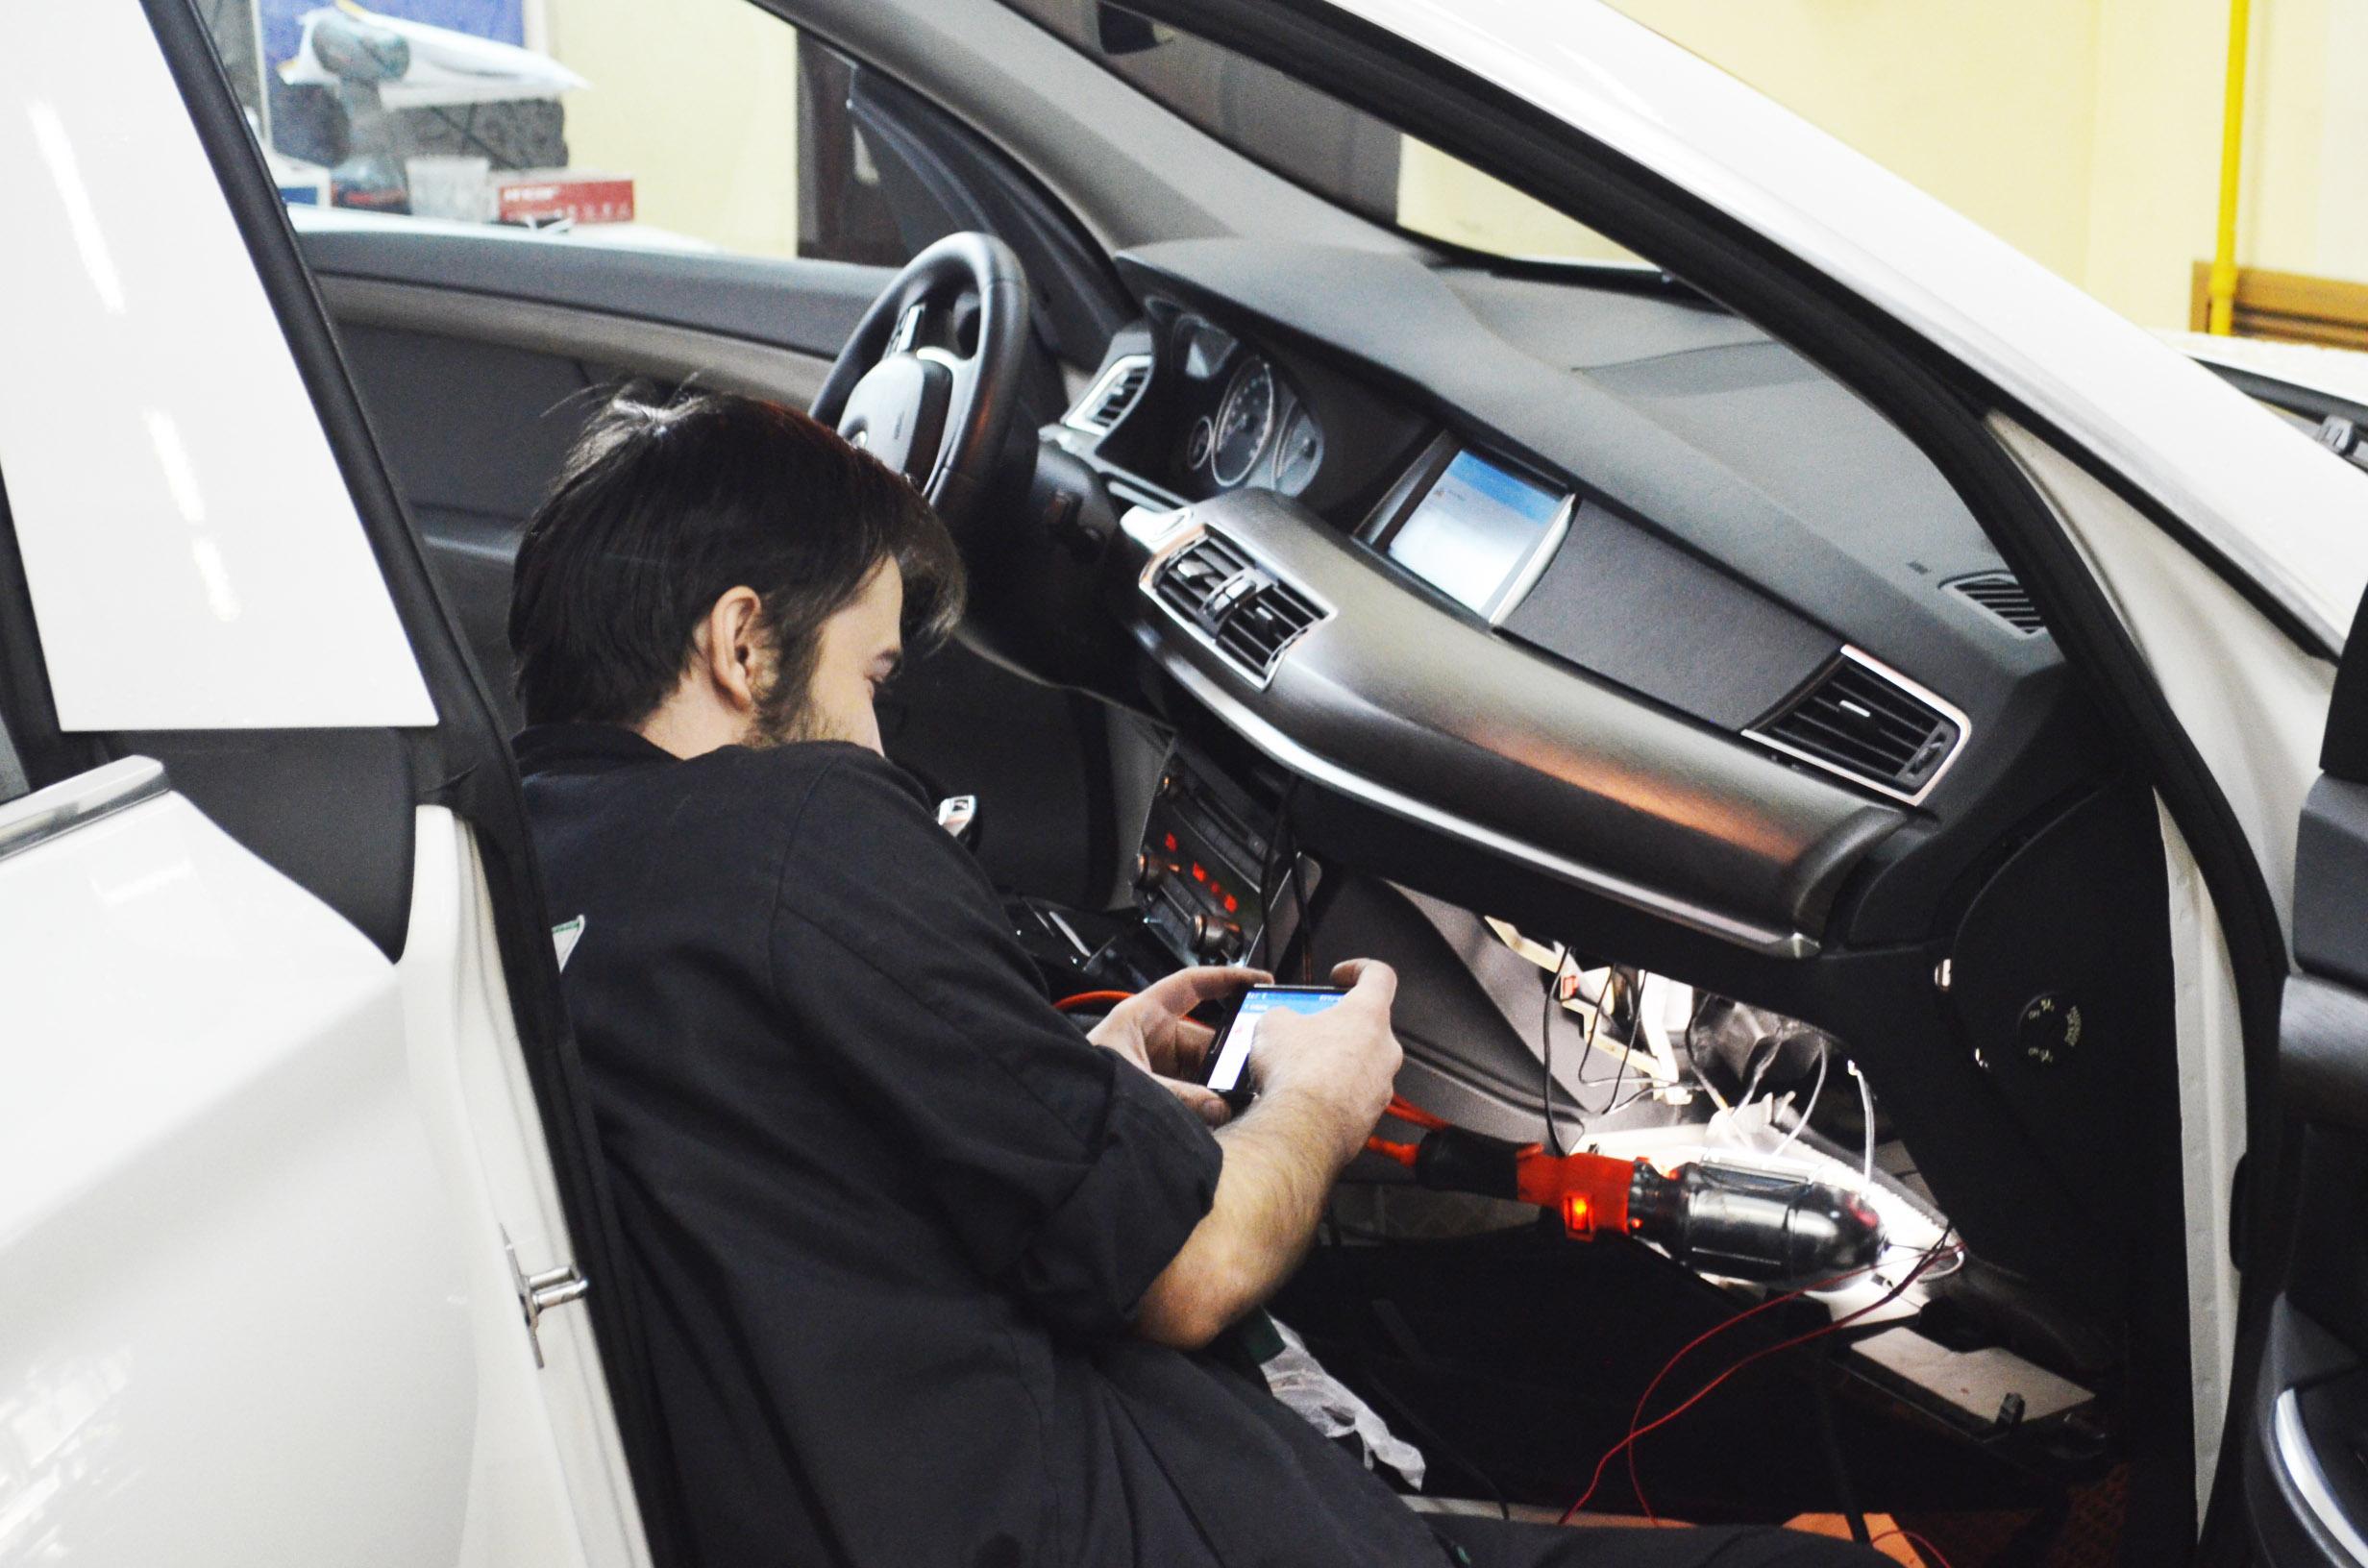 Установка Mirror link на BMW GT